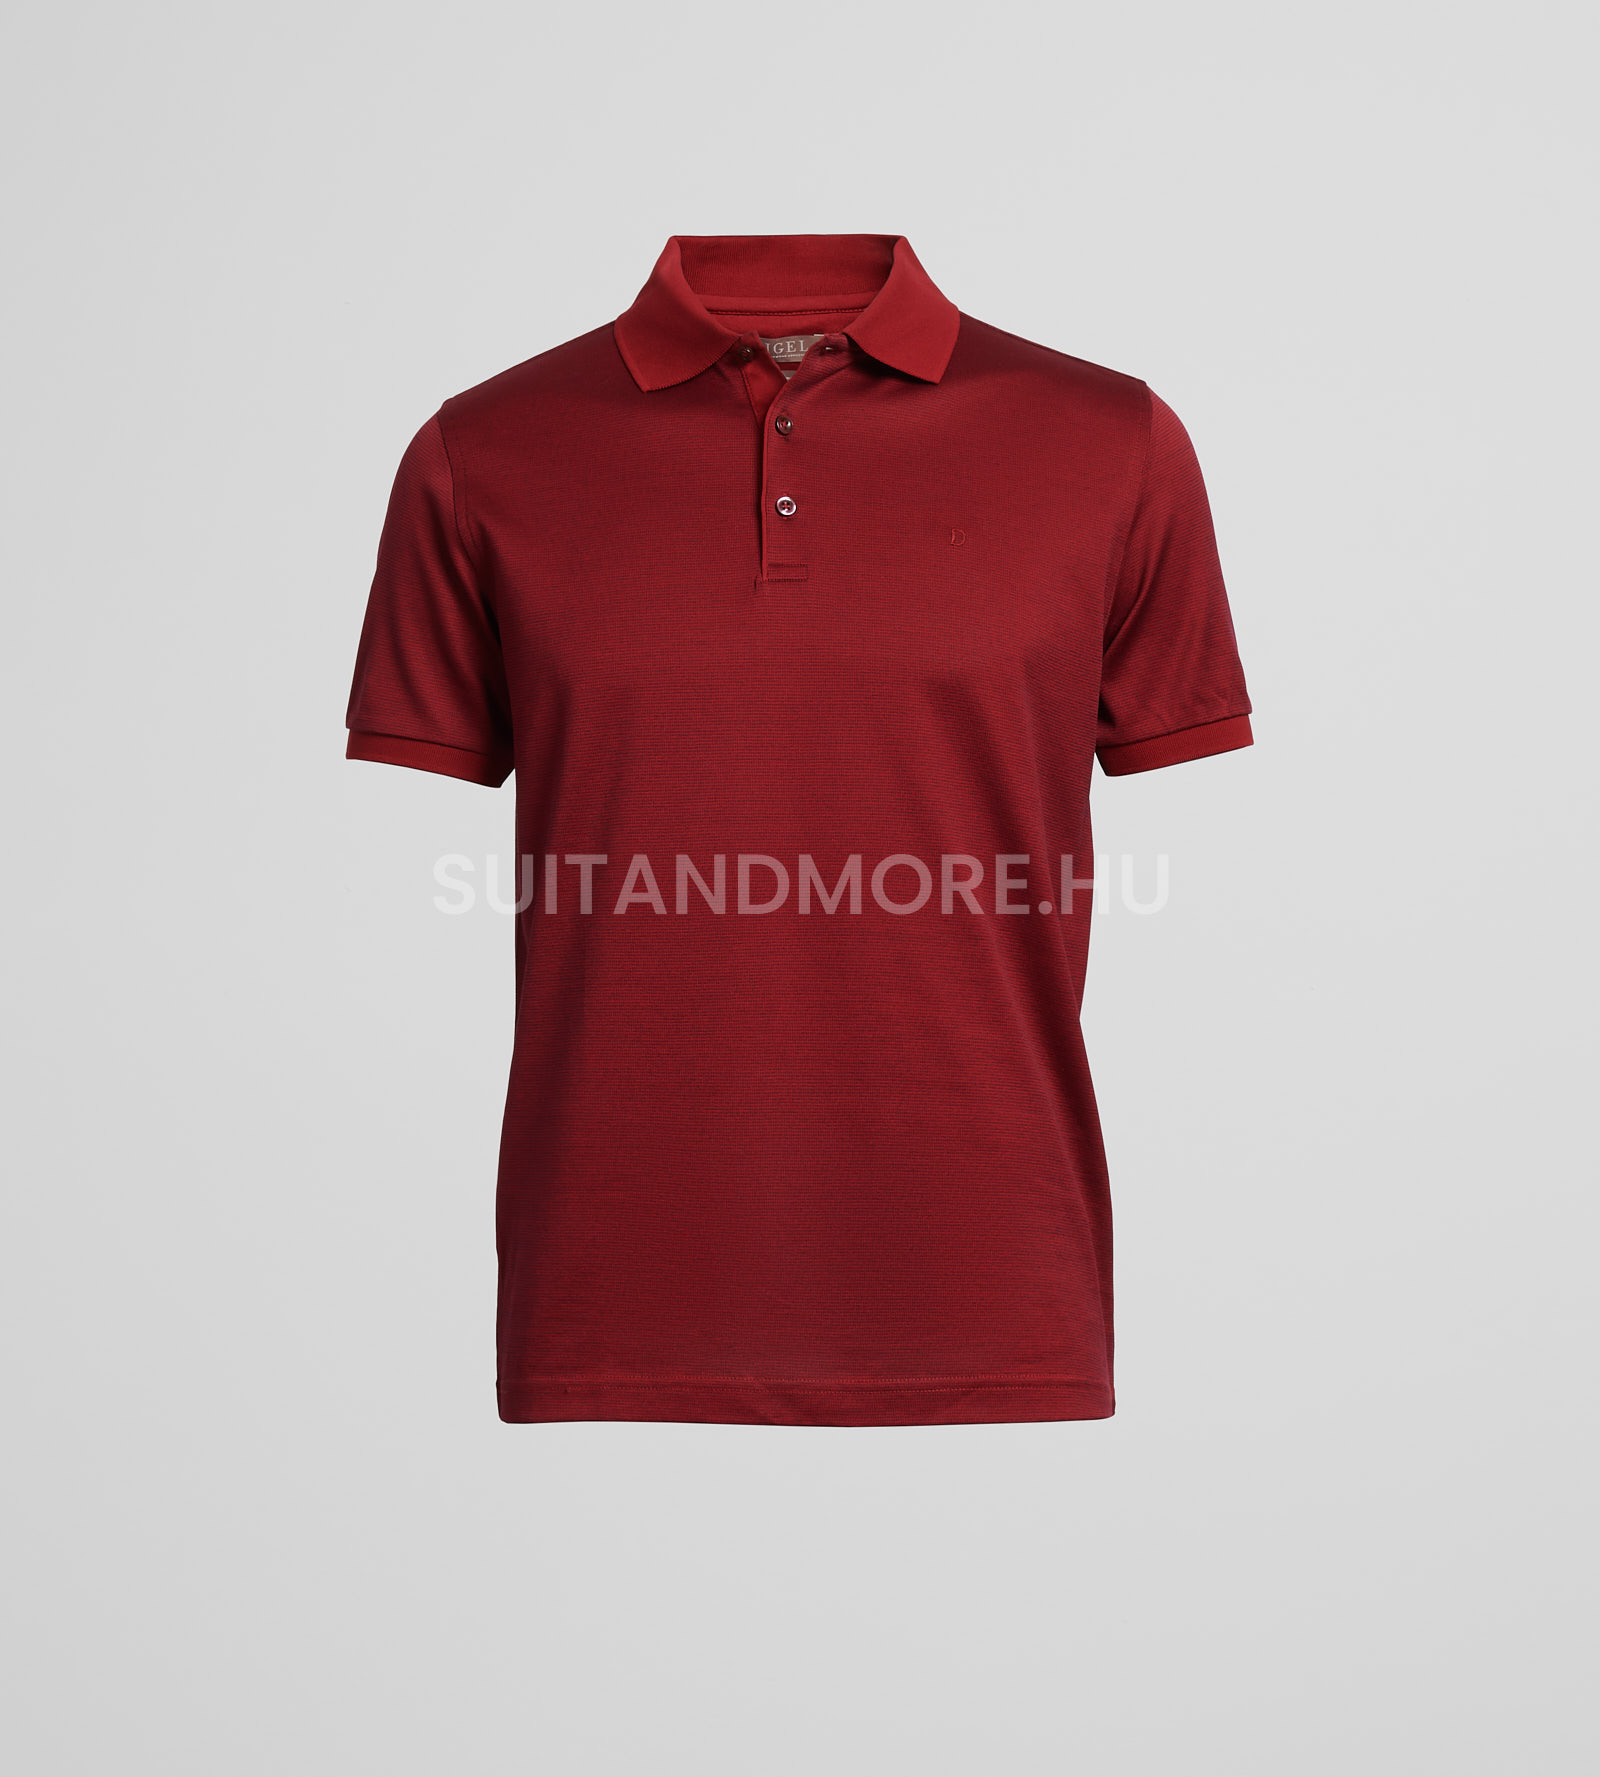 digel-piros-modern-fit-v-nyaku-ingpolo-tasso-1178125-65